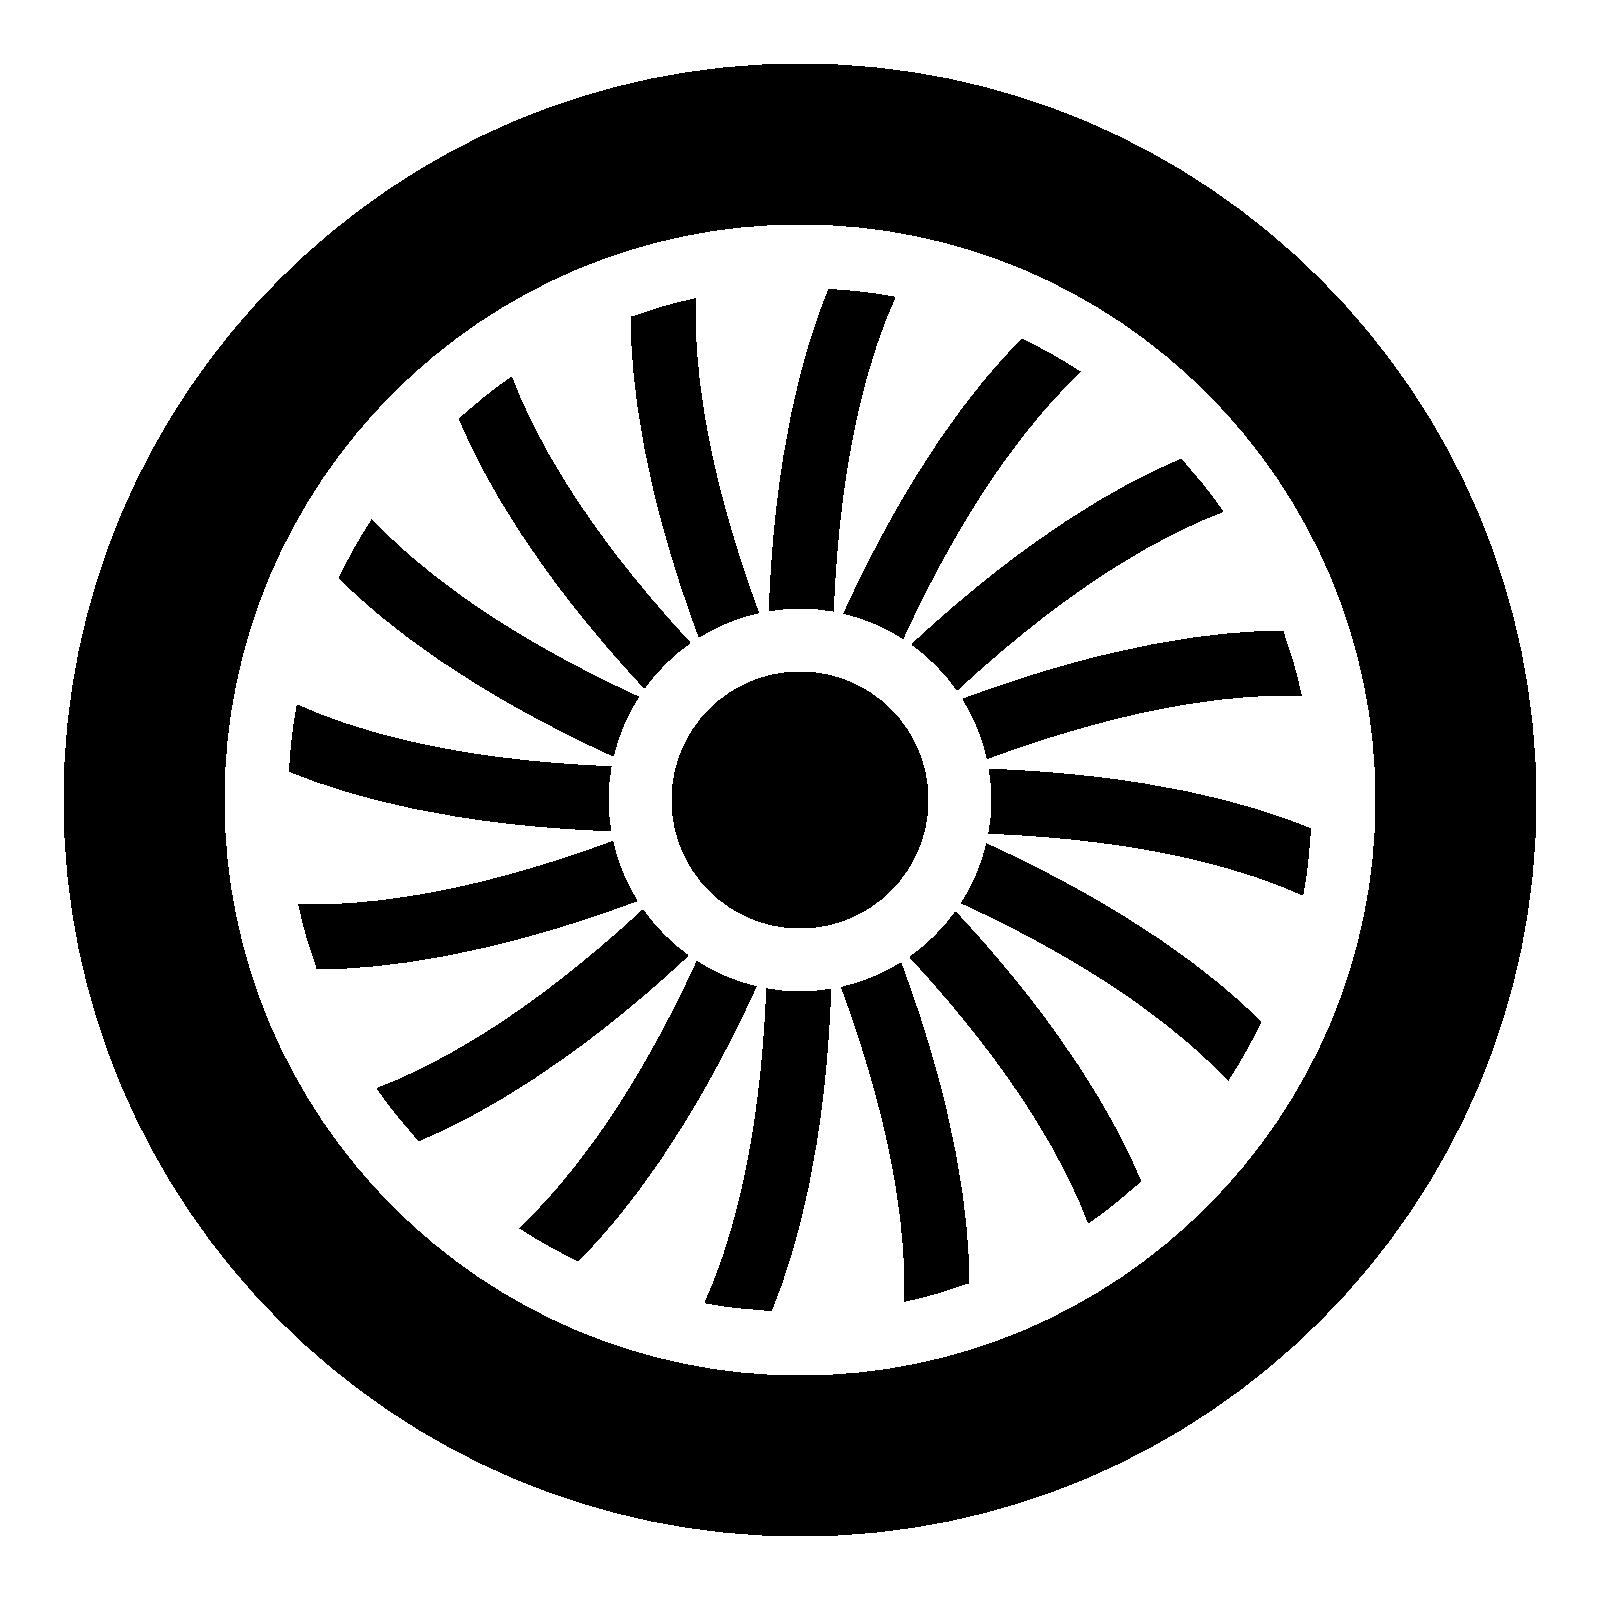 Jet clipart jet engine At Icons Ink Engine Download